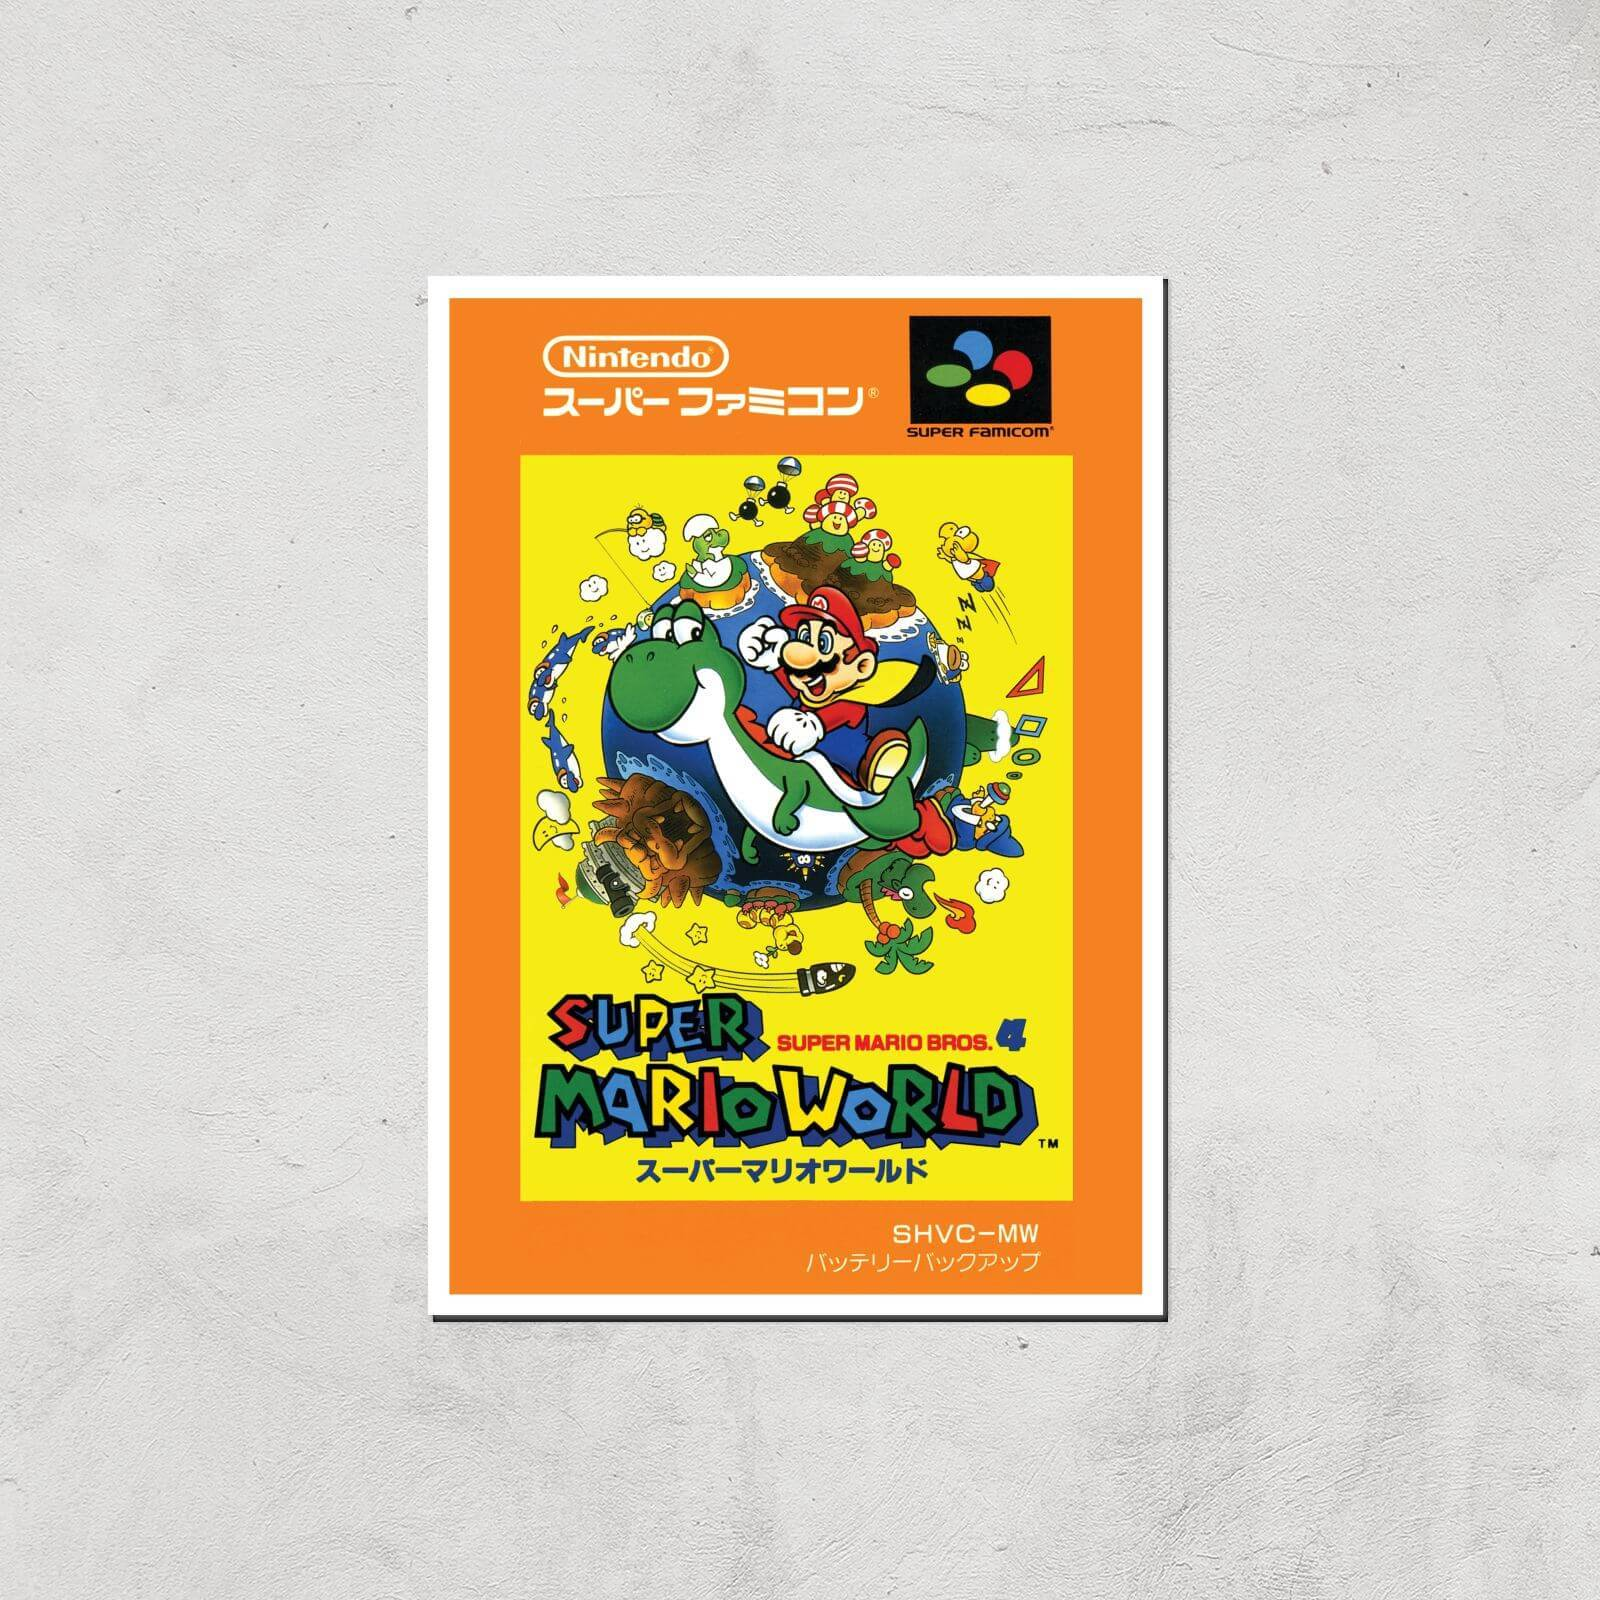 Nintendo Super Mario World Retro Cover Art Print - A4 - Print Only